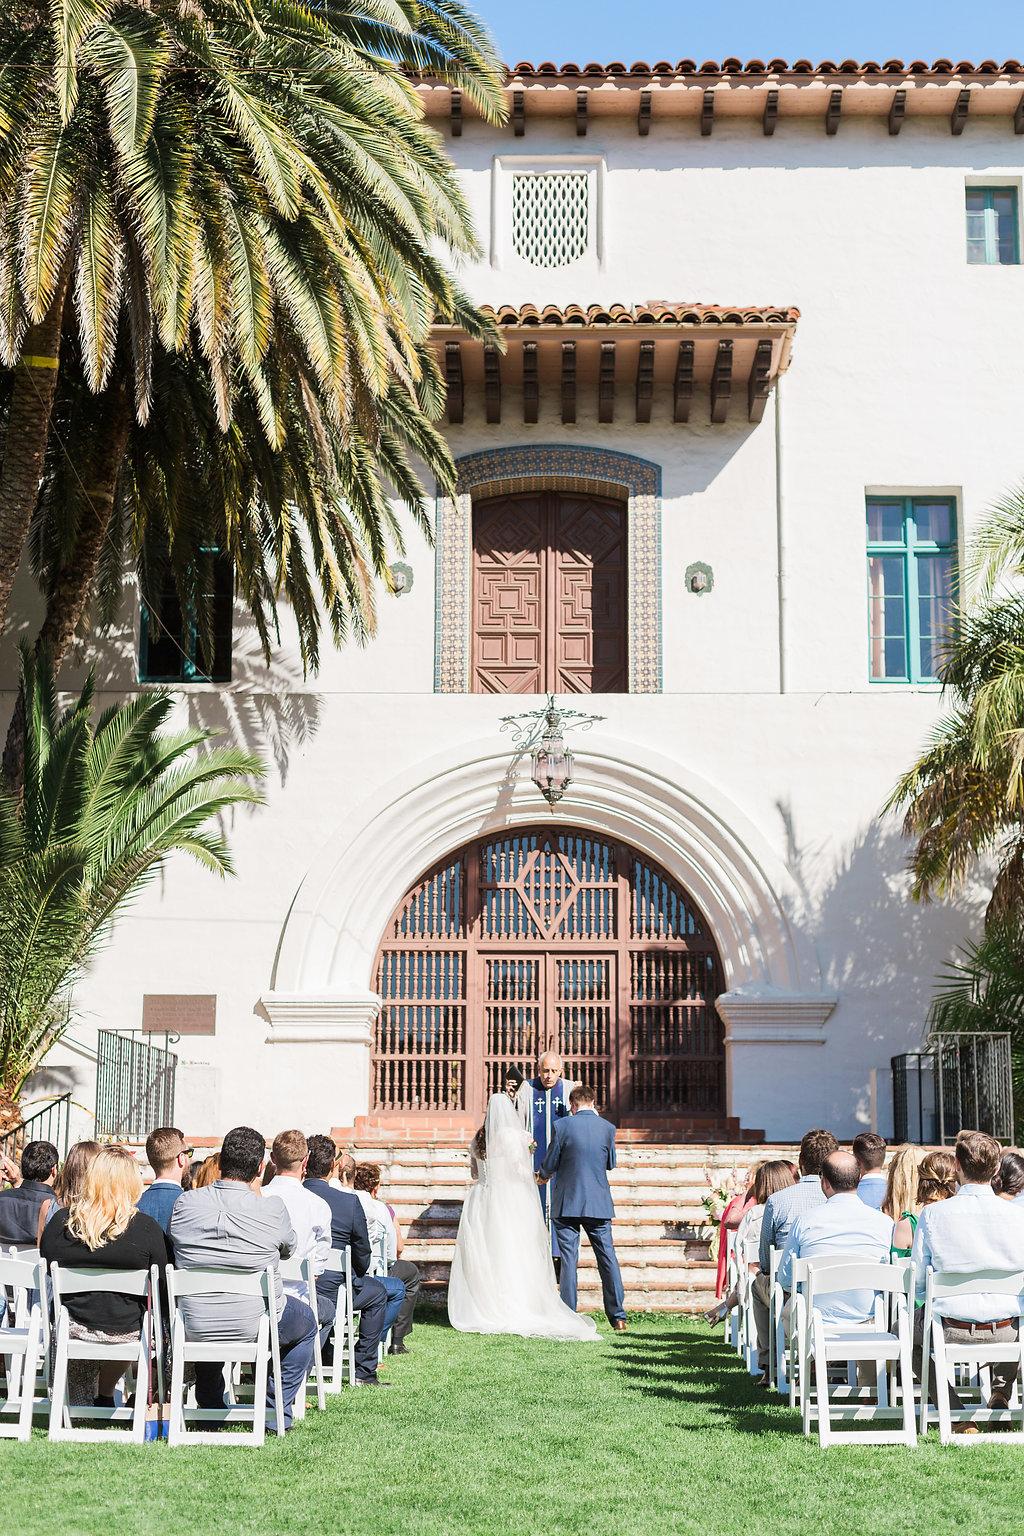 Santa-Barbara-Courthouse